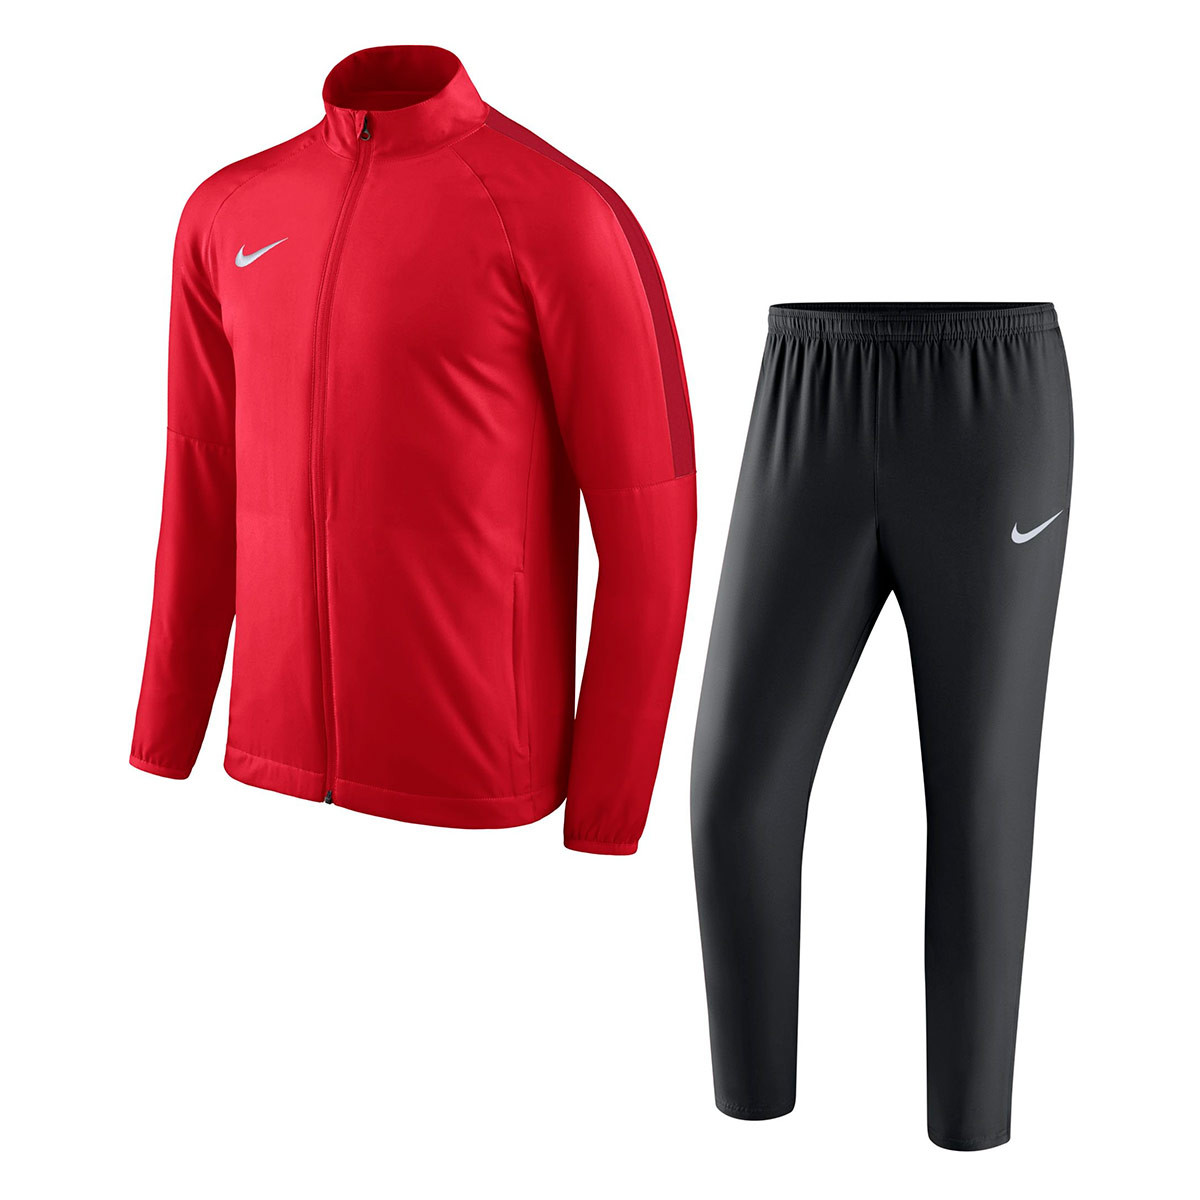 10bf1a638bc0 Tuta Nike Academy 18 Woven University red-Black-Black-Gym red-White -  Negozio di calcio Fútbol Emotion